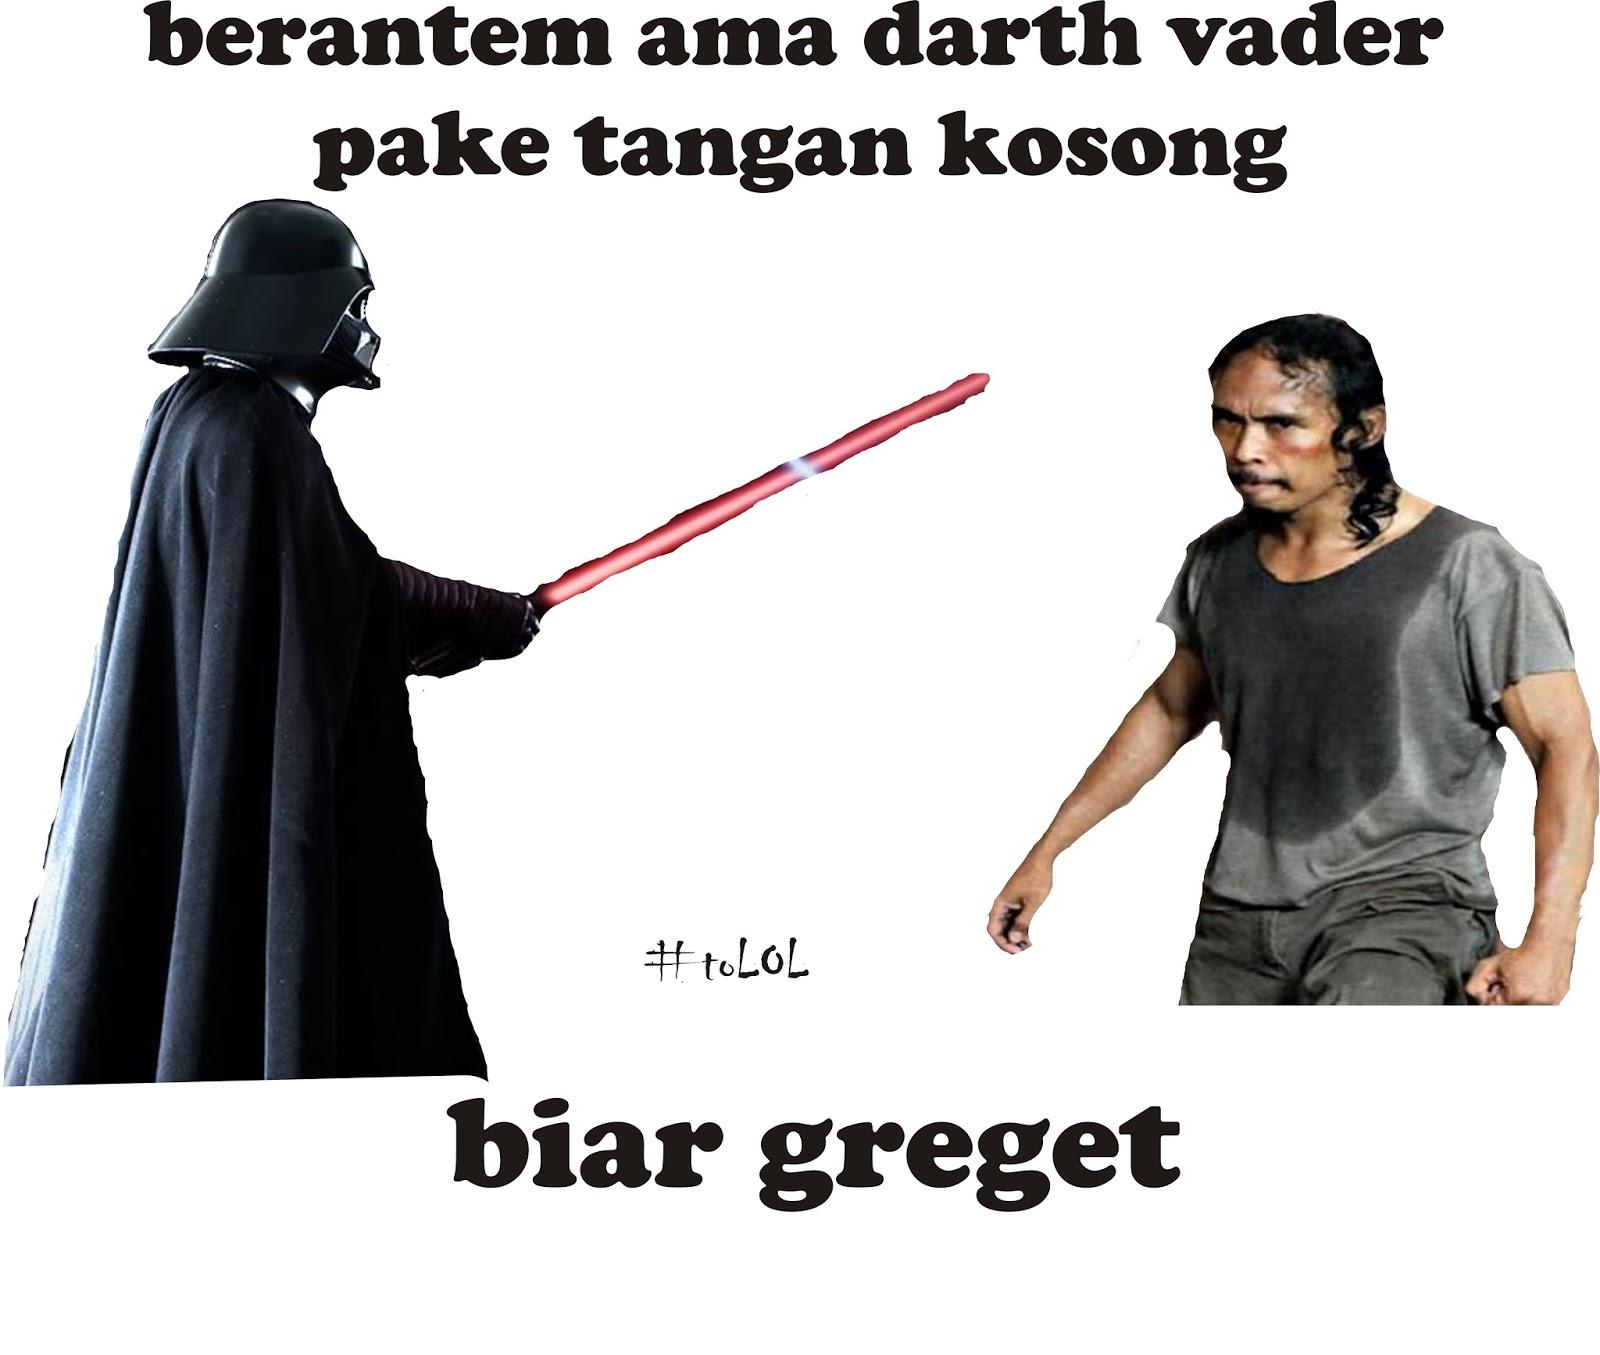 Kumpulan Gambar Meme Greget  Gambar Meme